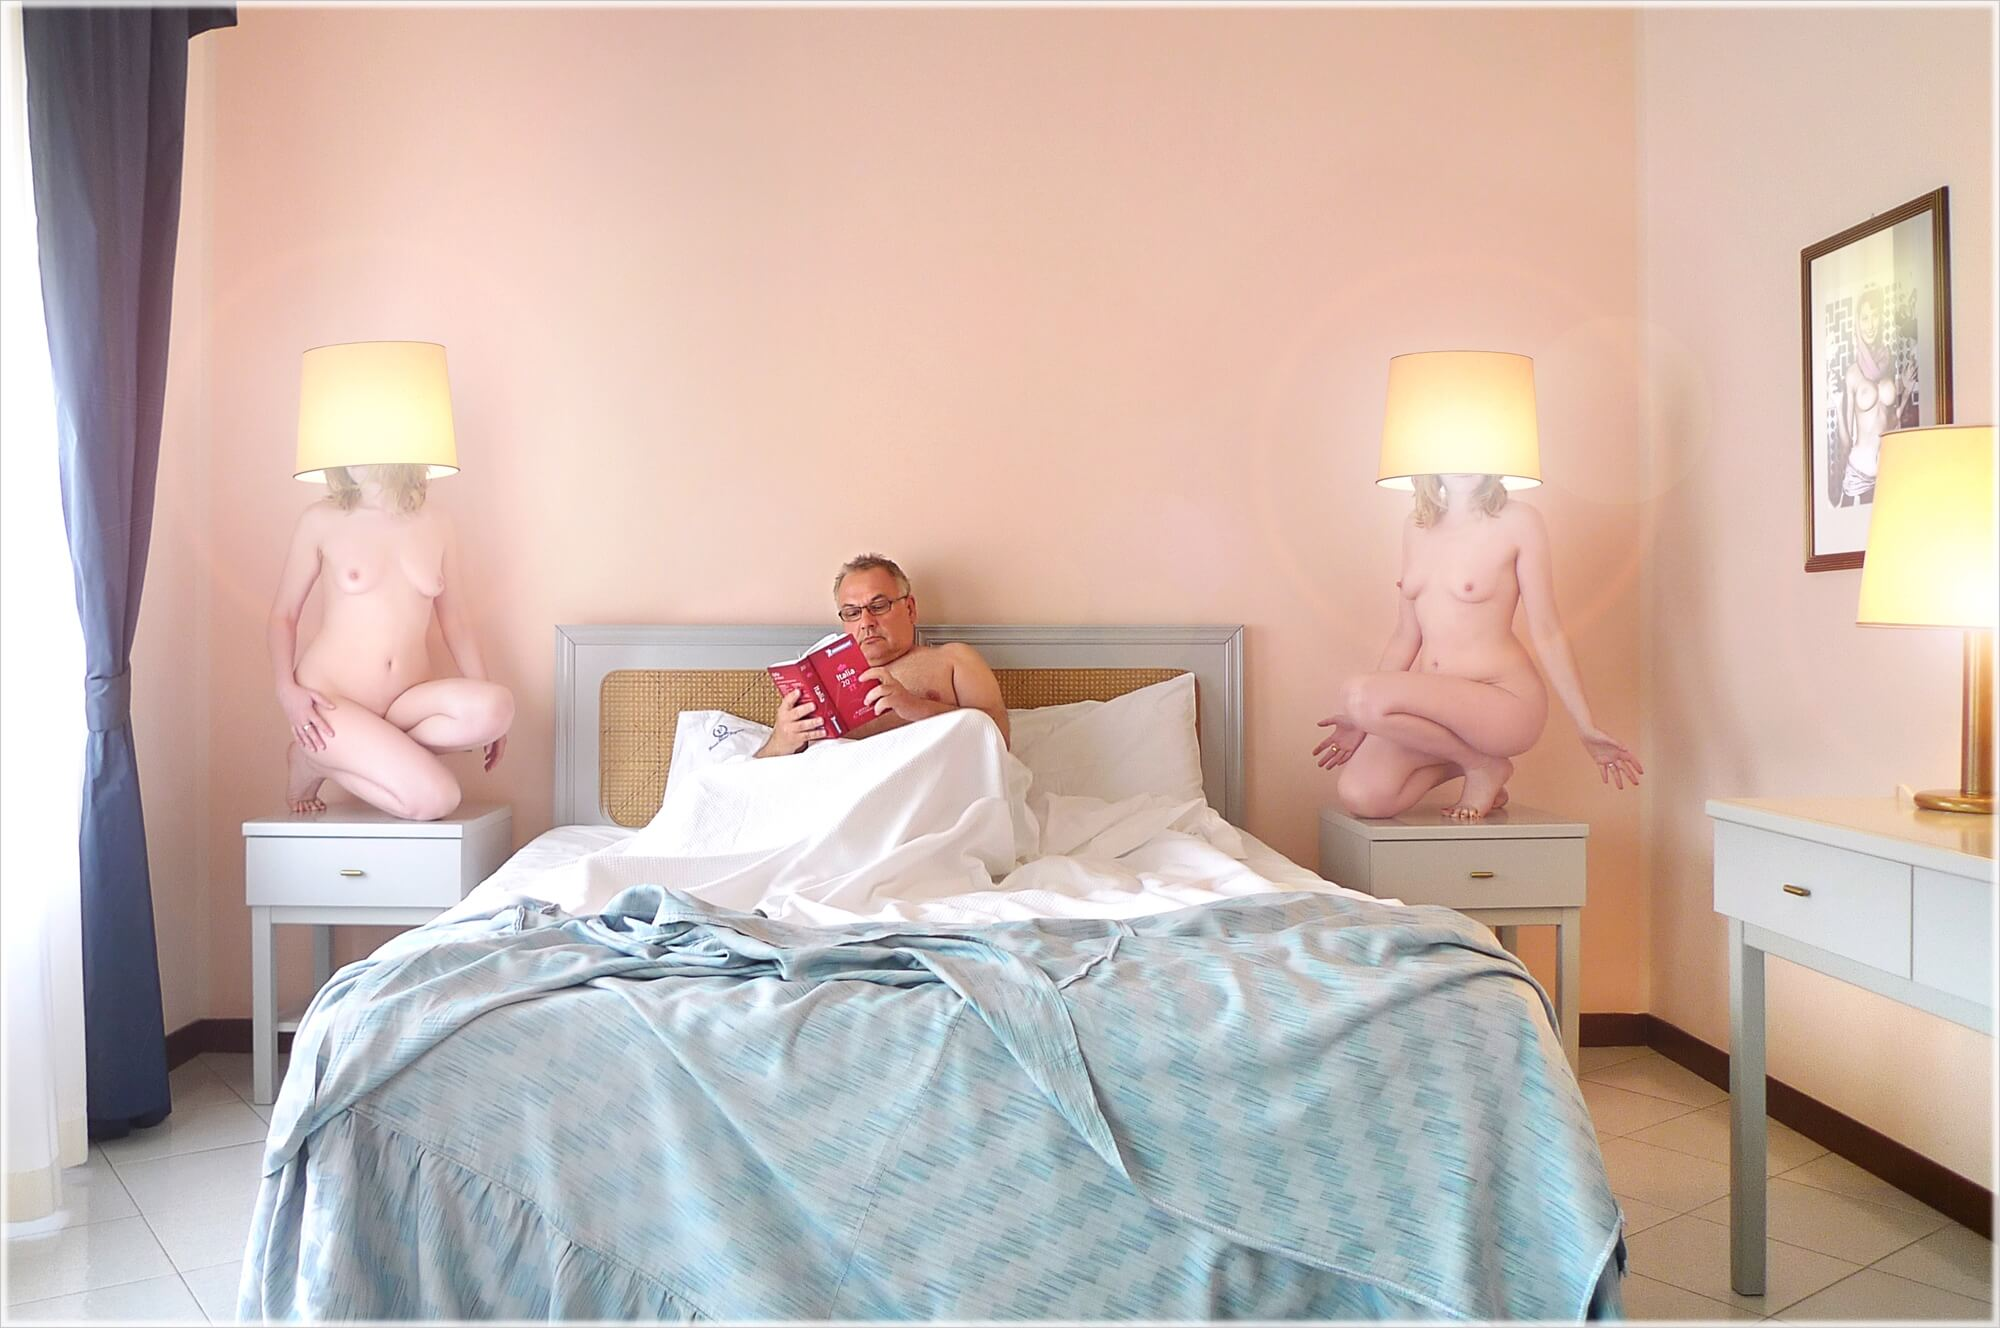 2013.05.25 Grand Hotel Fagiano Palace Formia